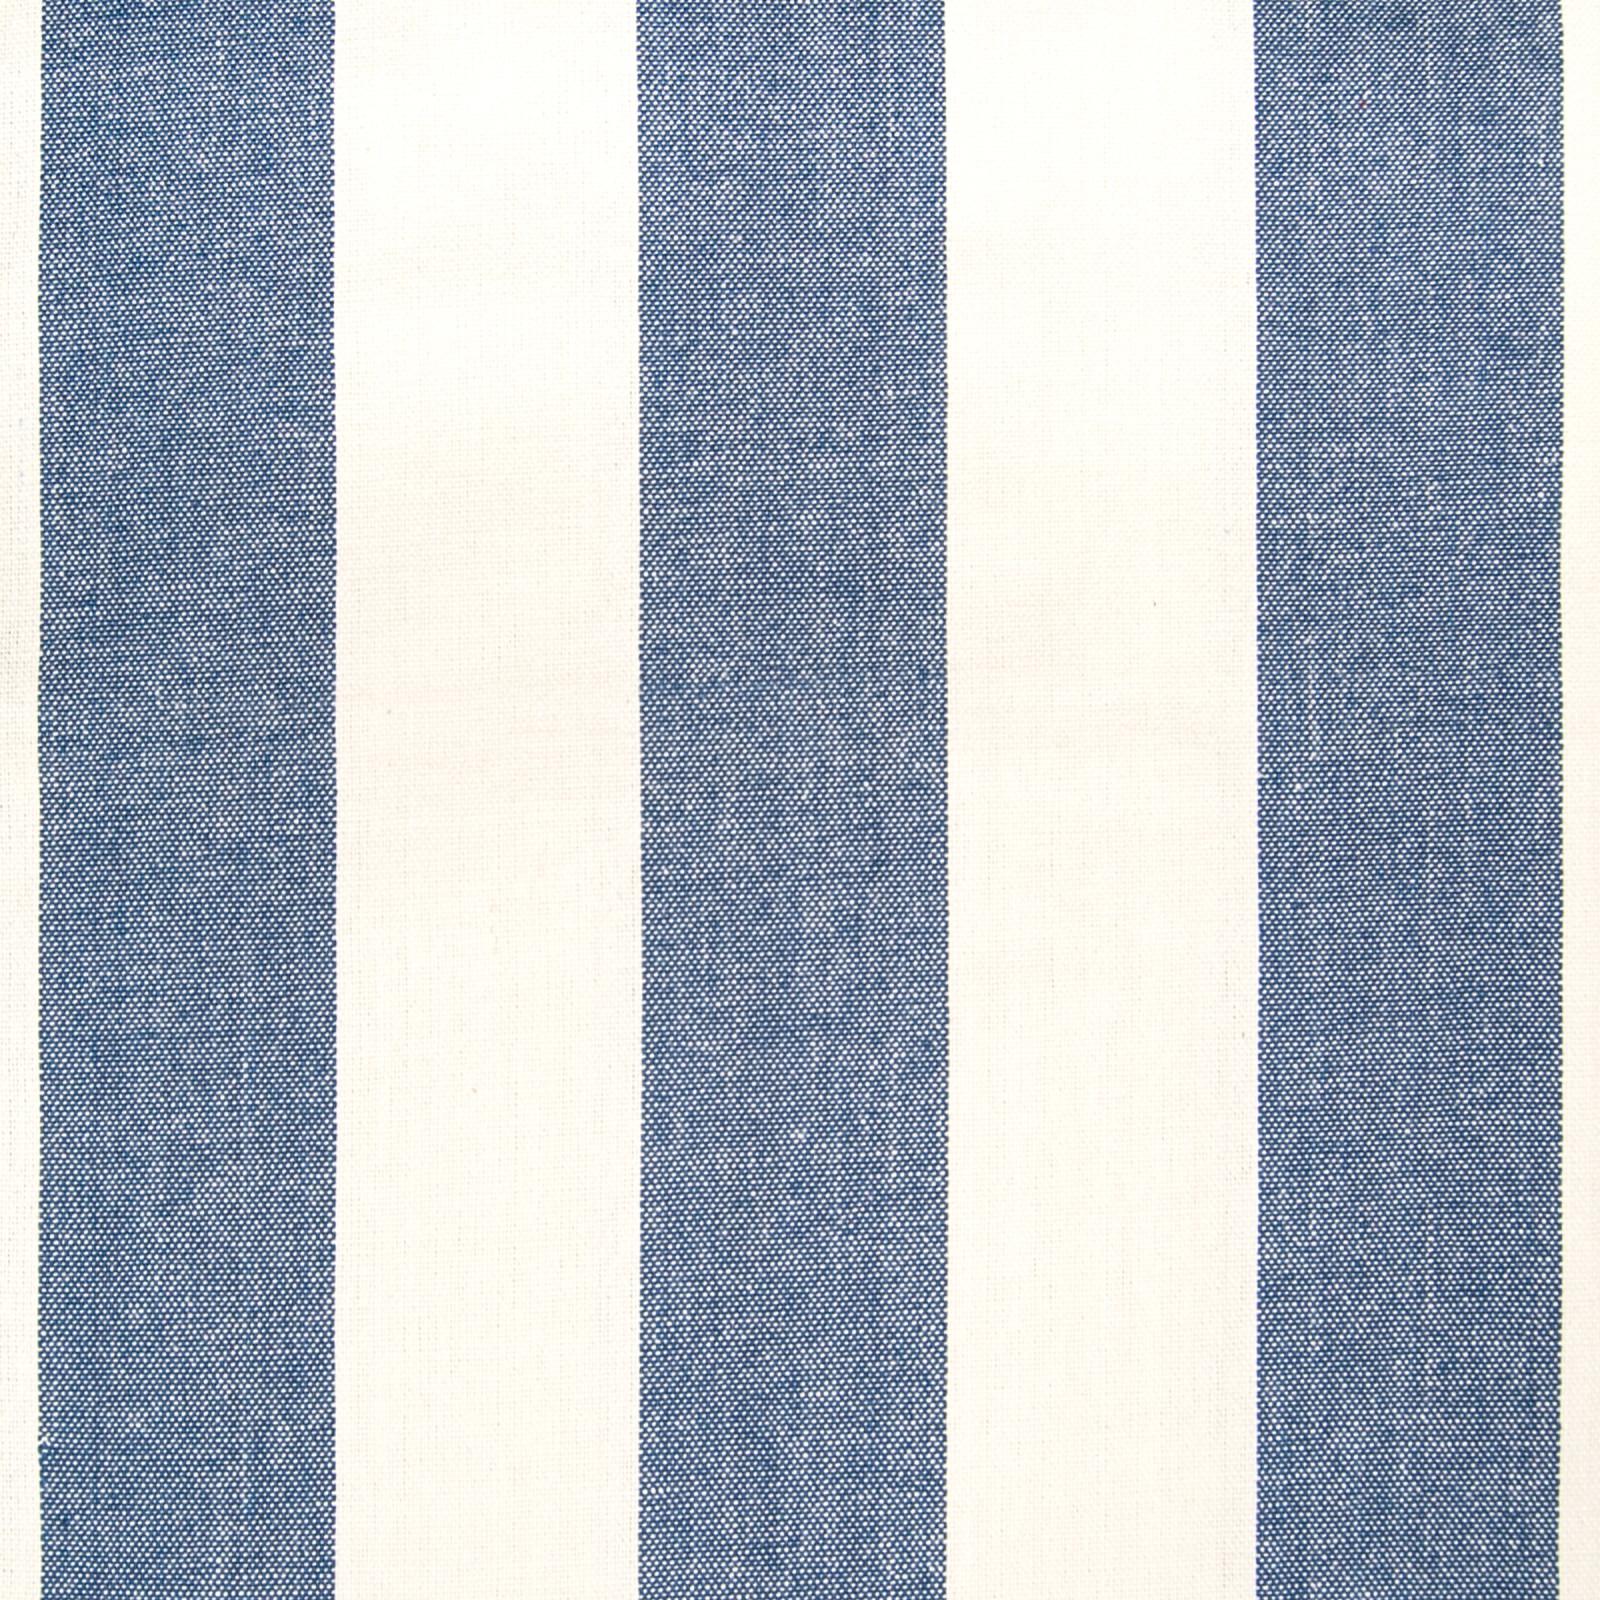 B3019 Nautical Greenhouse Fabrics